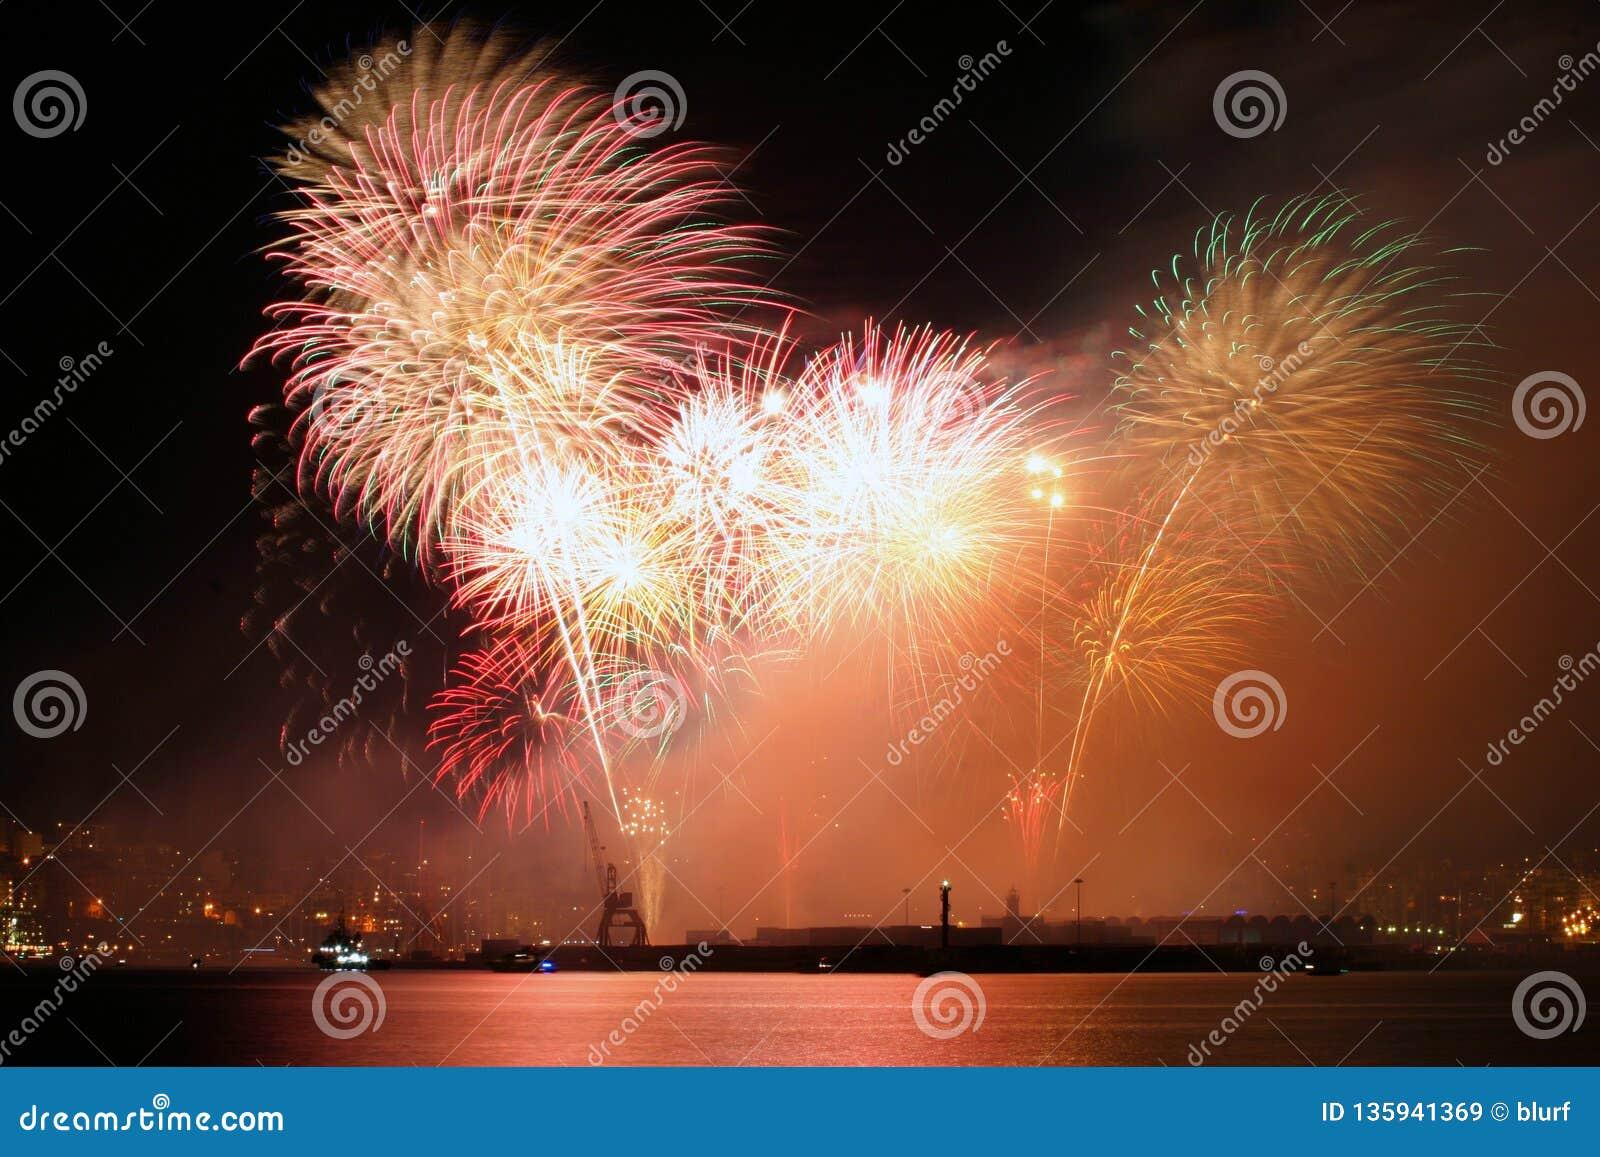 Fireworks over palma de mallorca port to celebrate local patron festivity